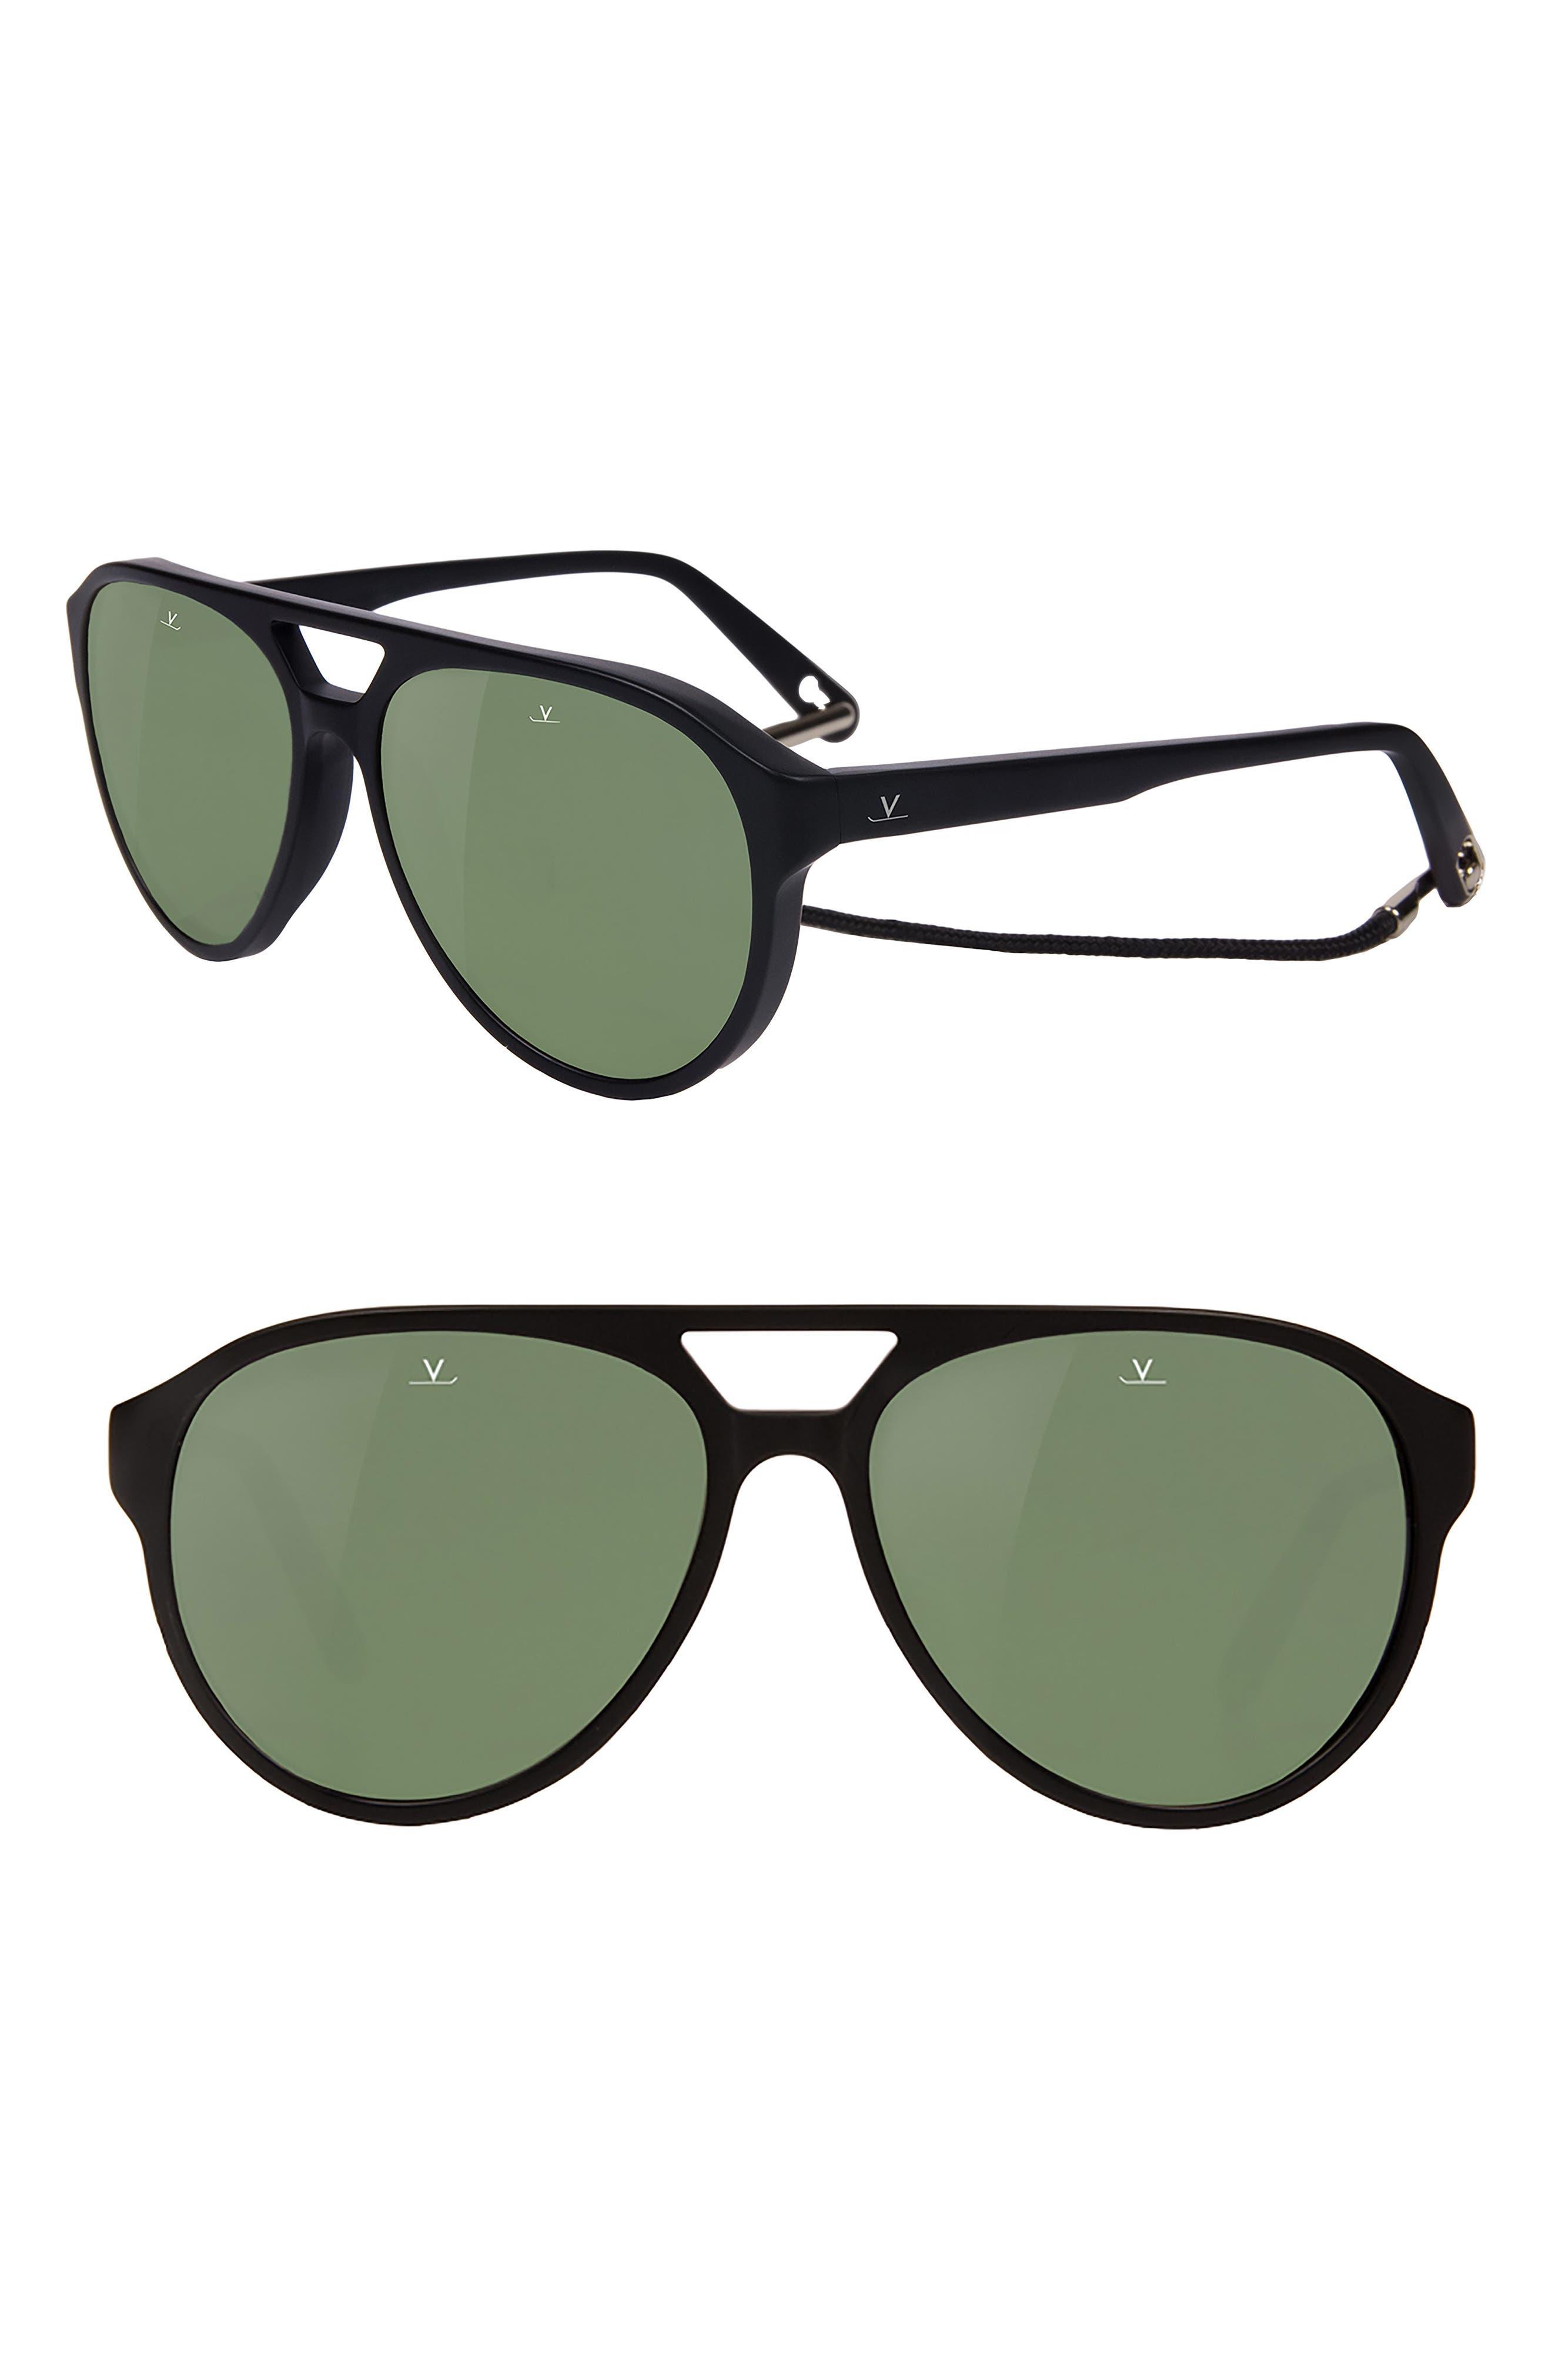 Main Image - Vuarnet Tom 64mm Sunglasses